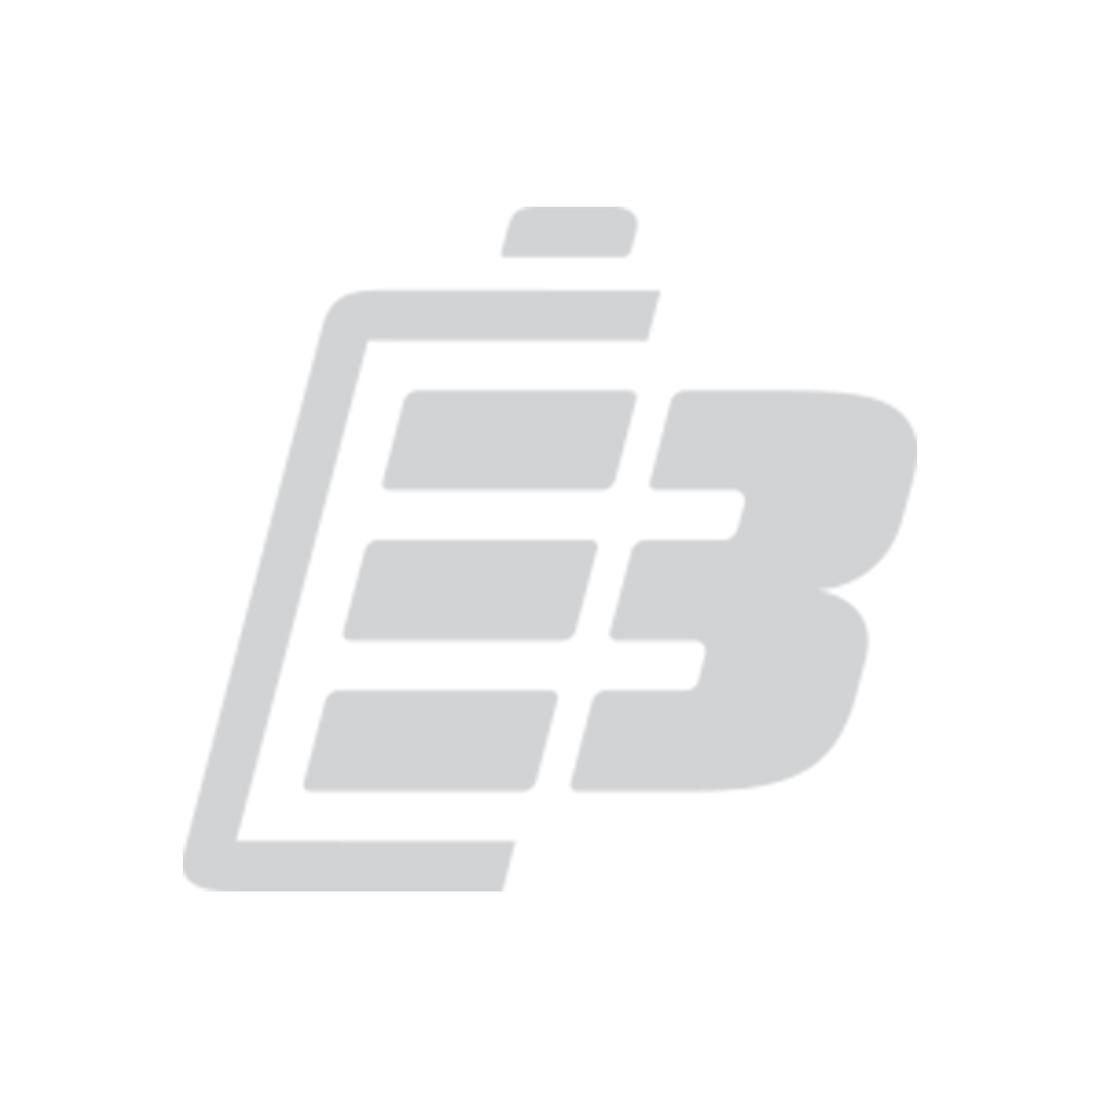 Wireless mouse battery Logitech MX1000_1